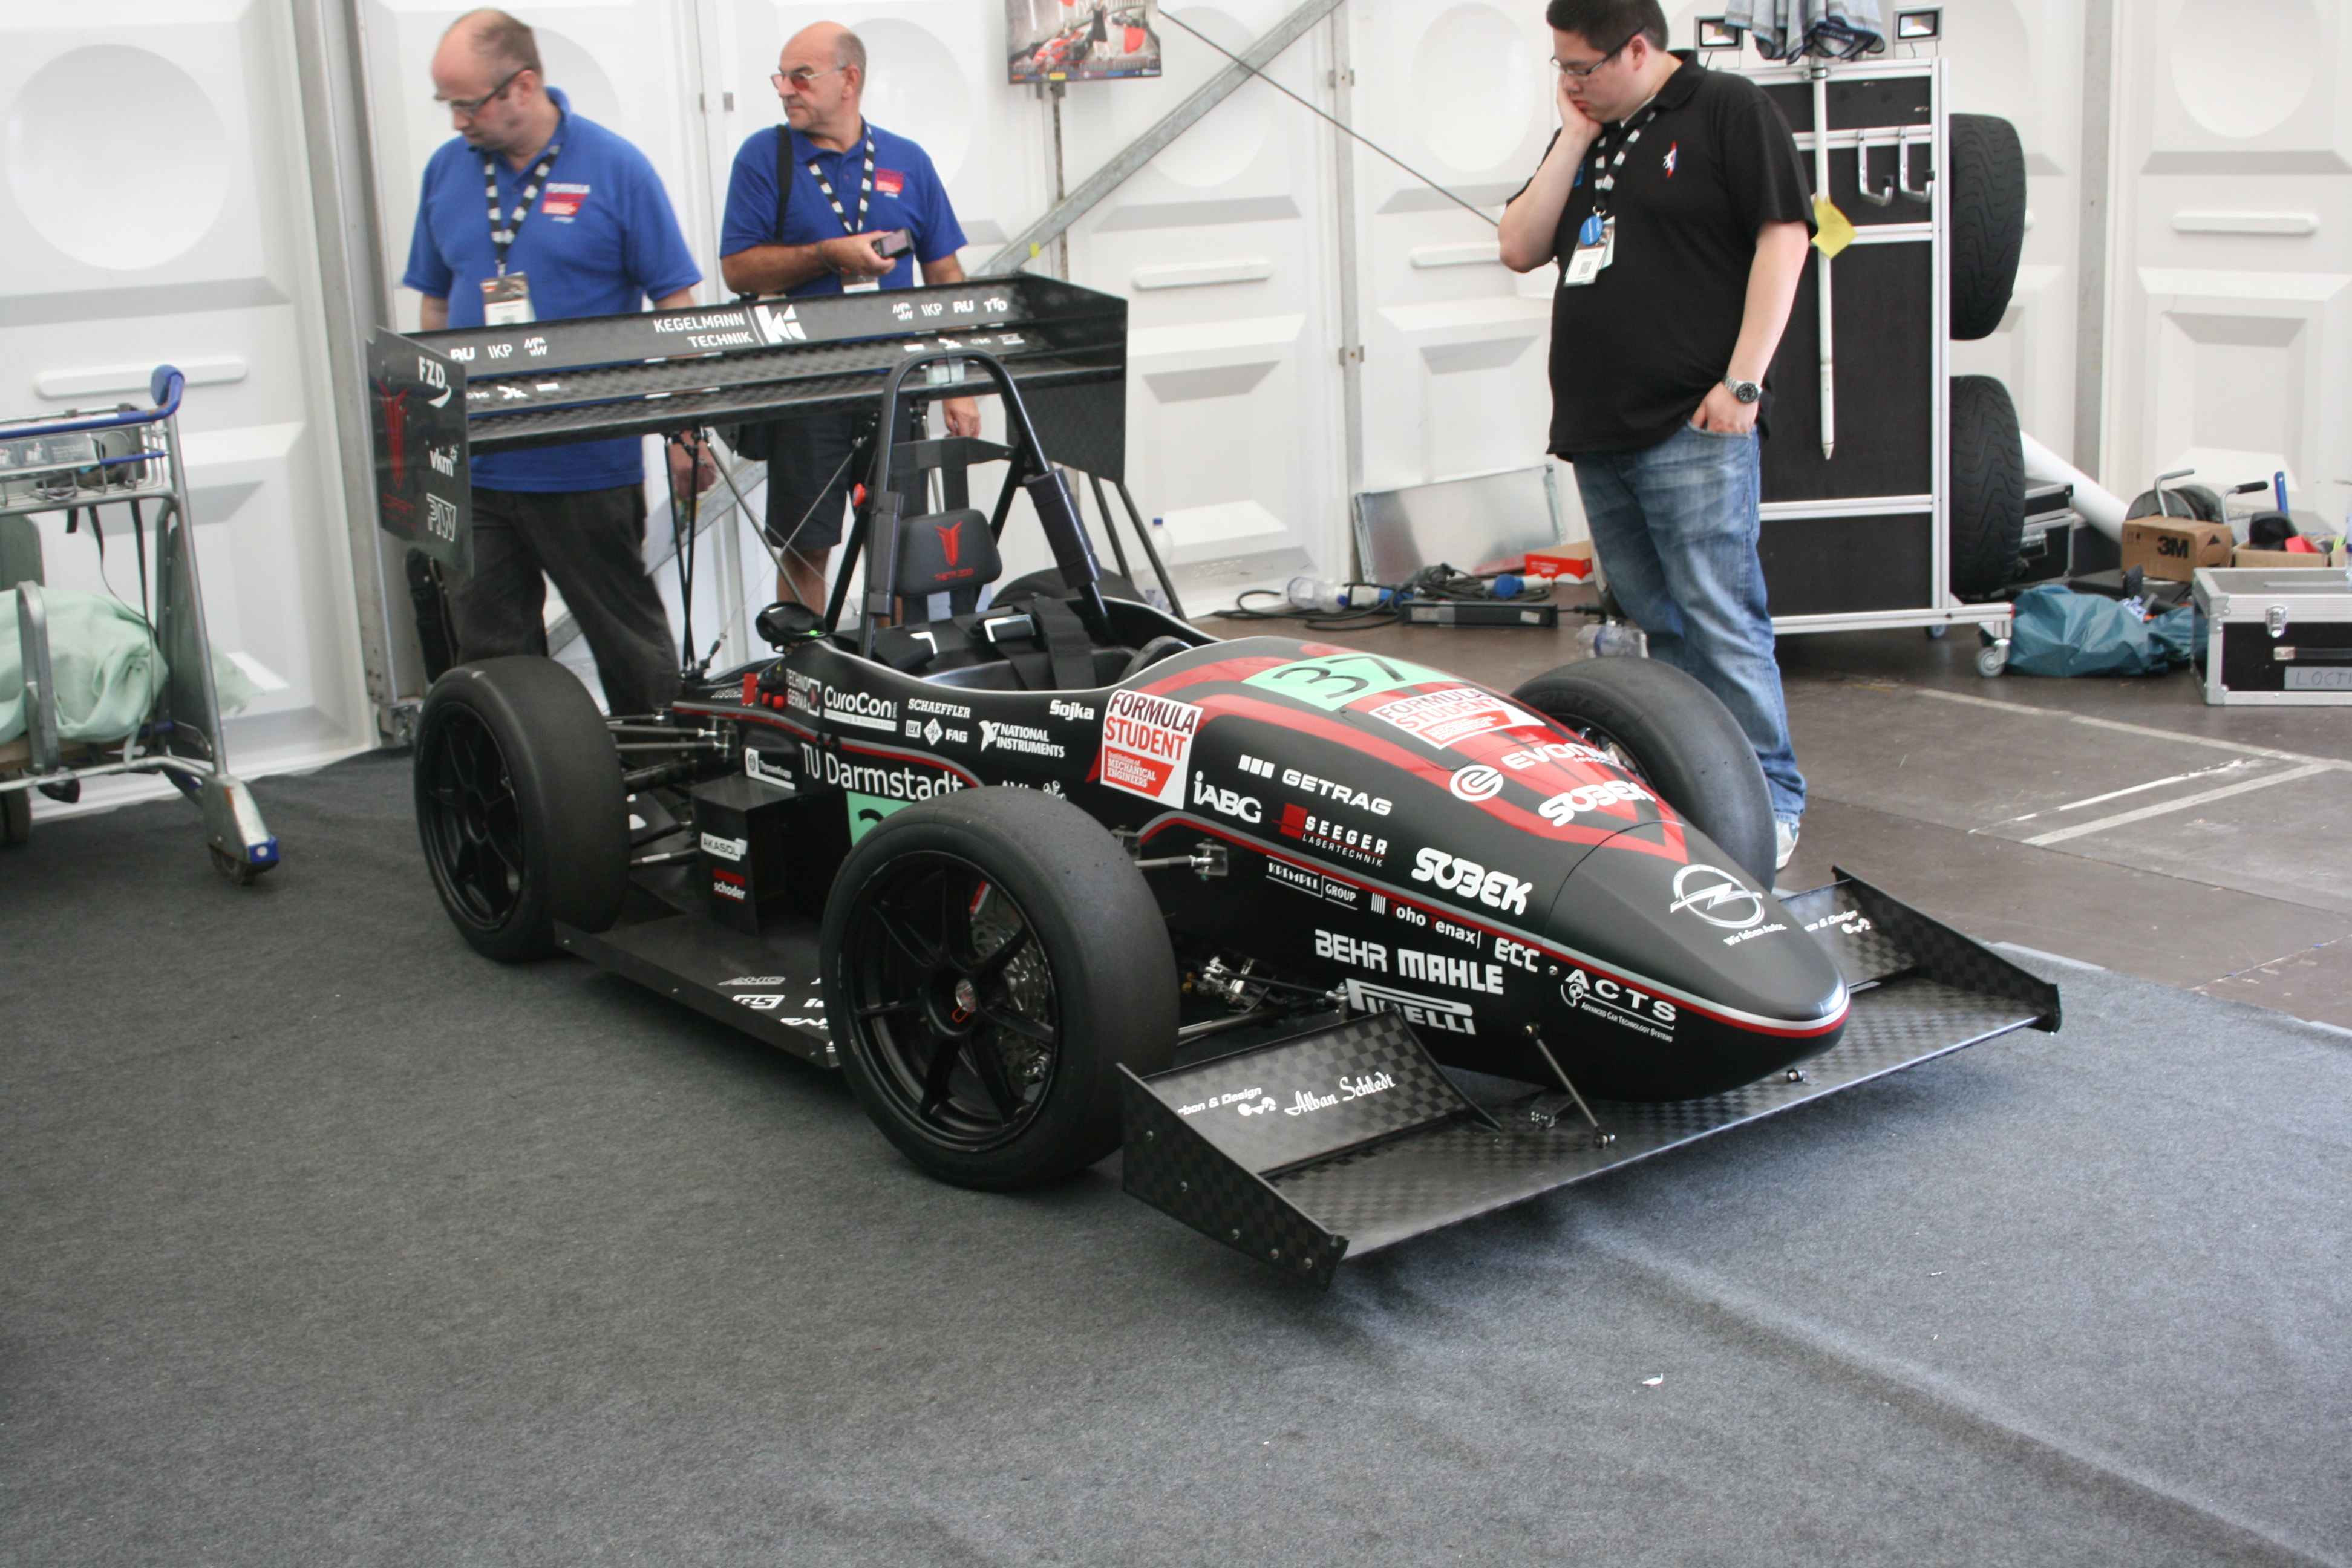 Formulastudent_proformance22